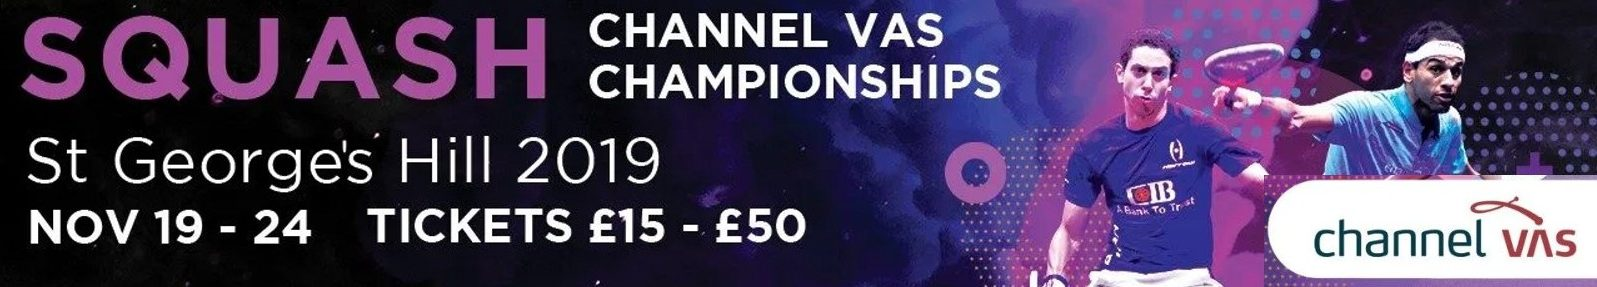 channel VAS Squash Championship